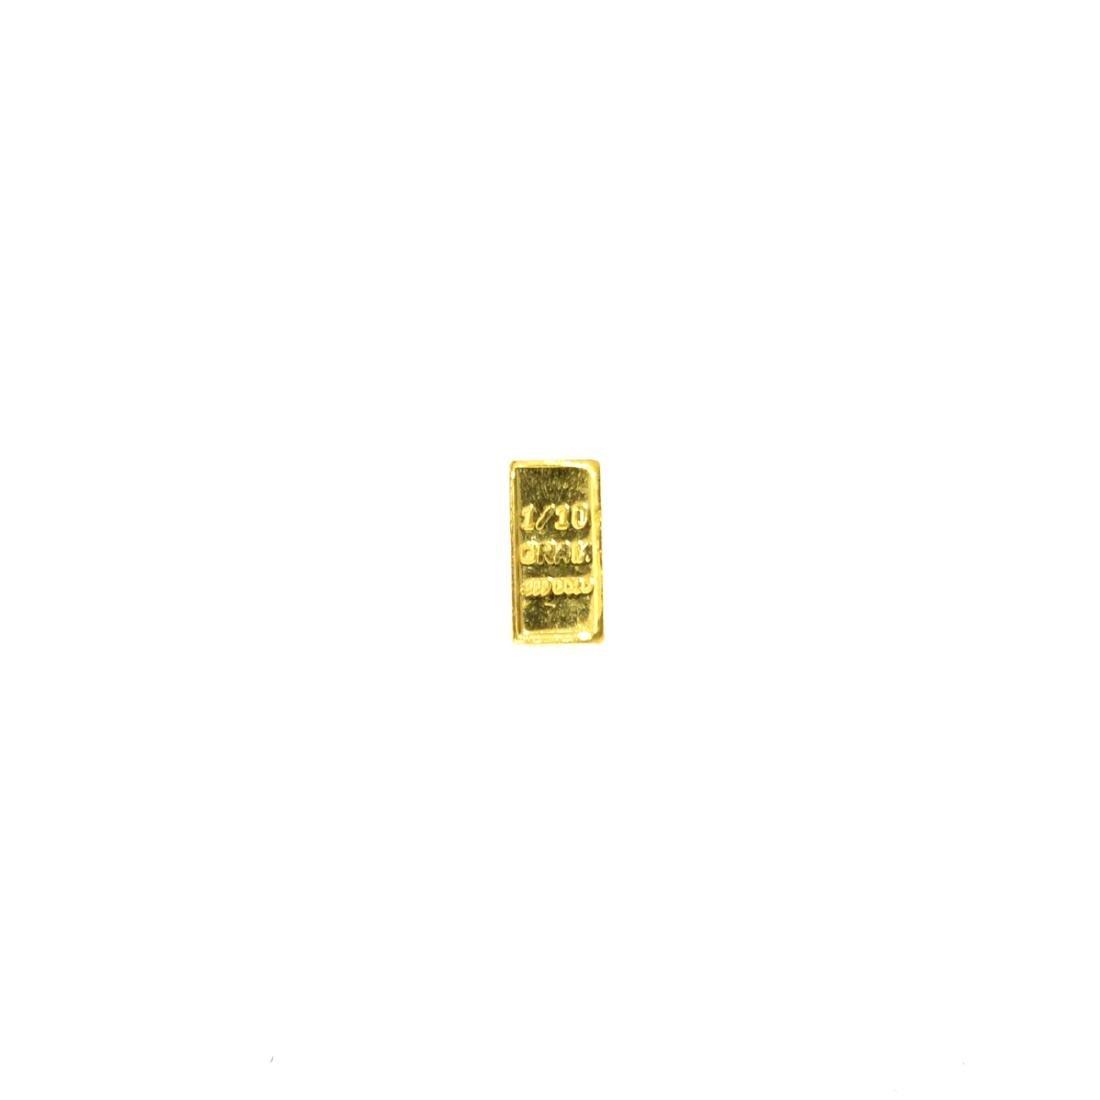 0.10 (1/10) Gram .999 Fine Gold Bar